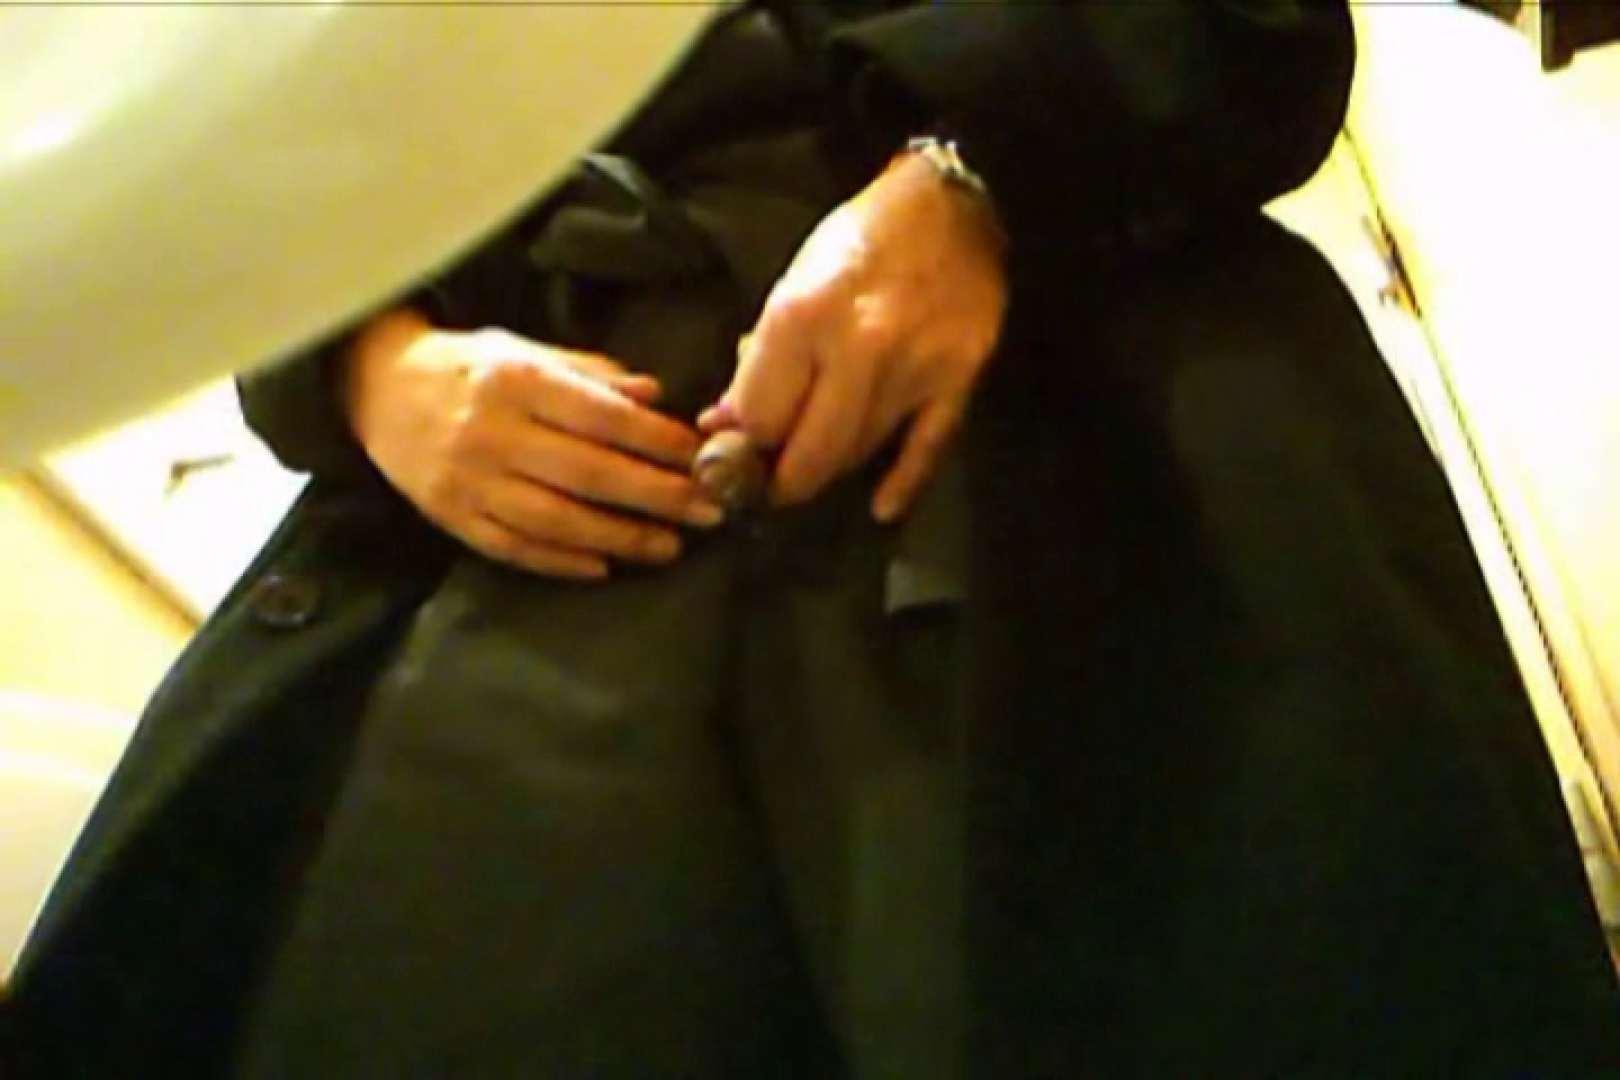 Gボーイ初投稿!掴み取りさんの洗面所覗き!in新幹線!VOL.15 男に首ったけ ちんこ画像 81連発 3